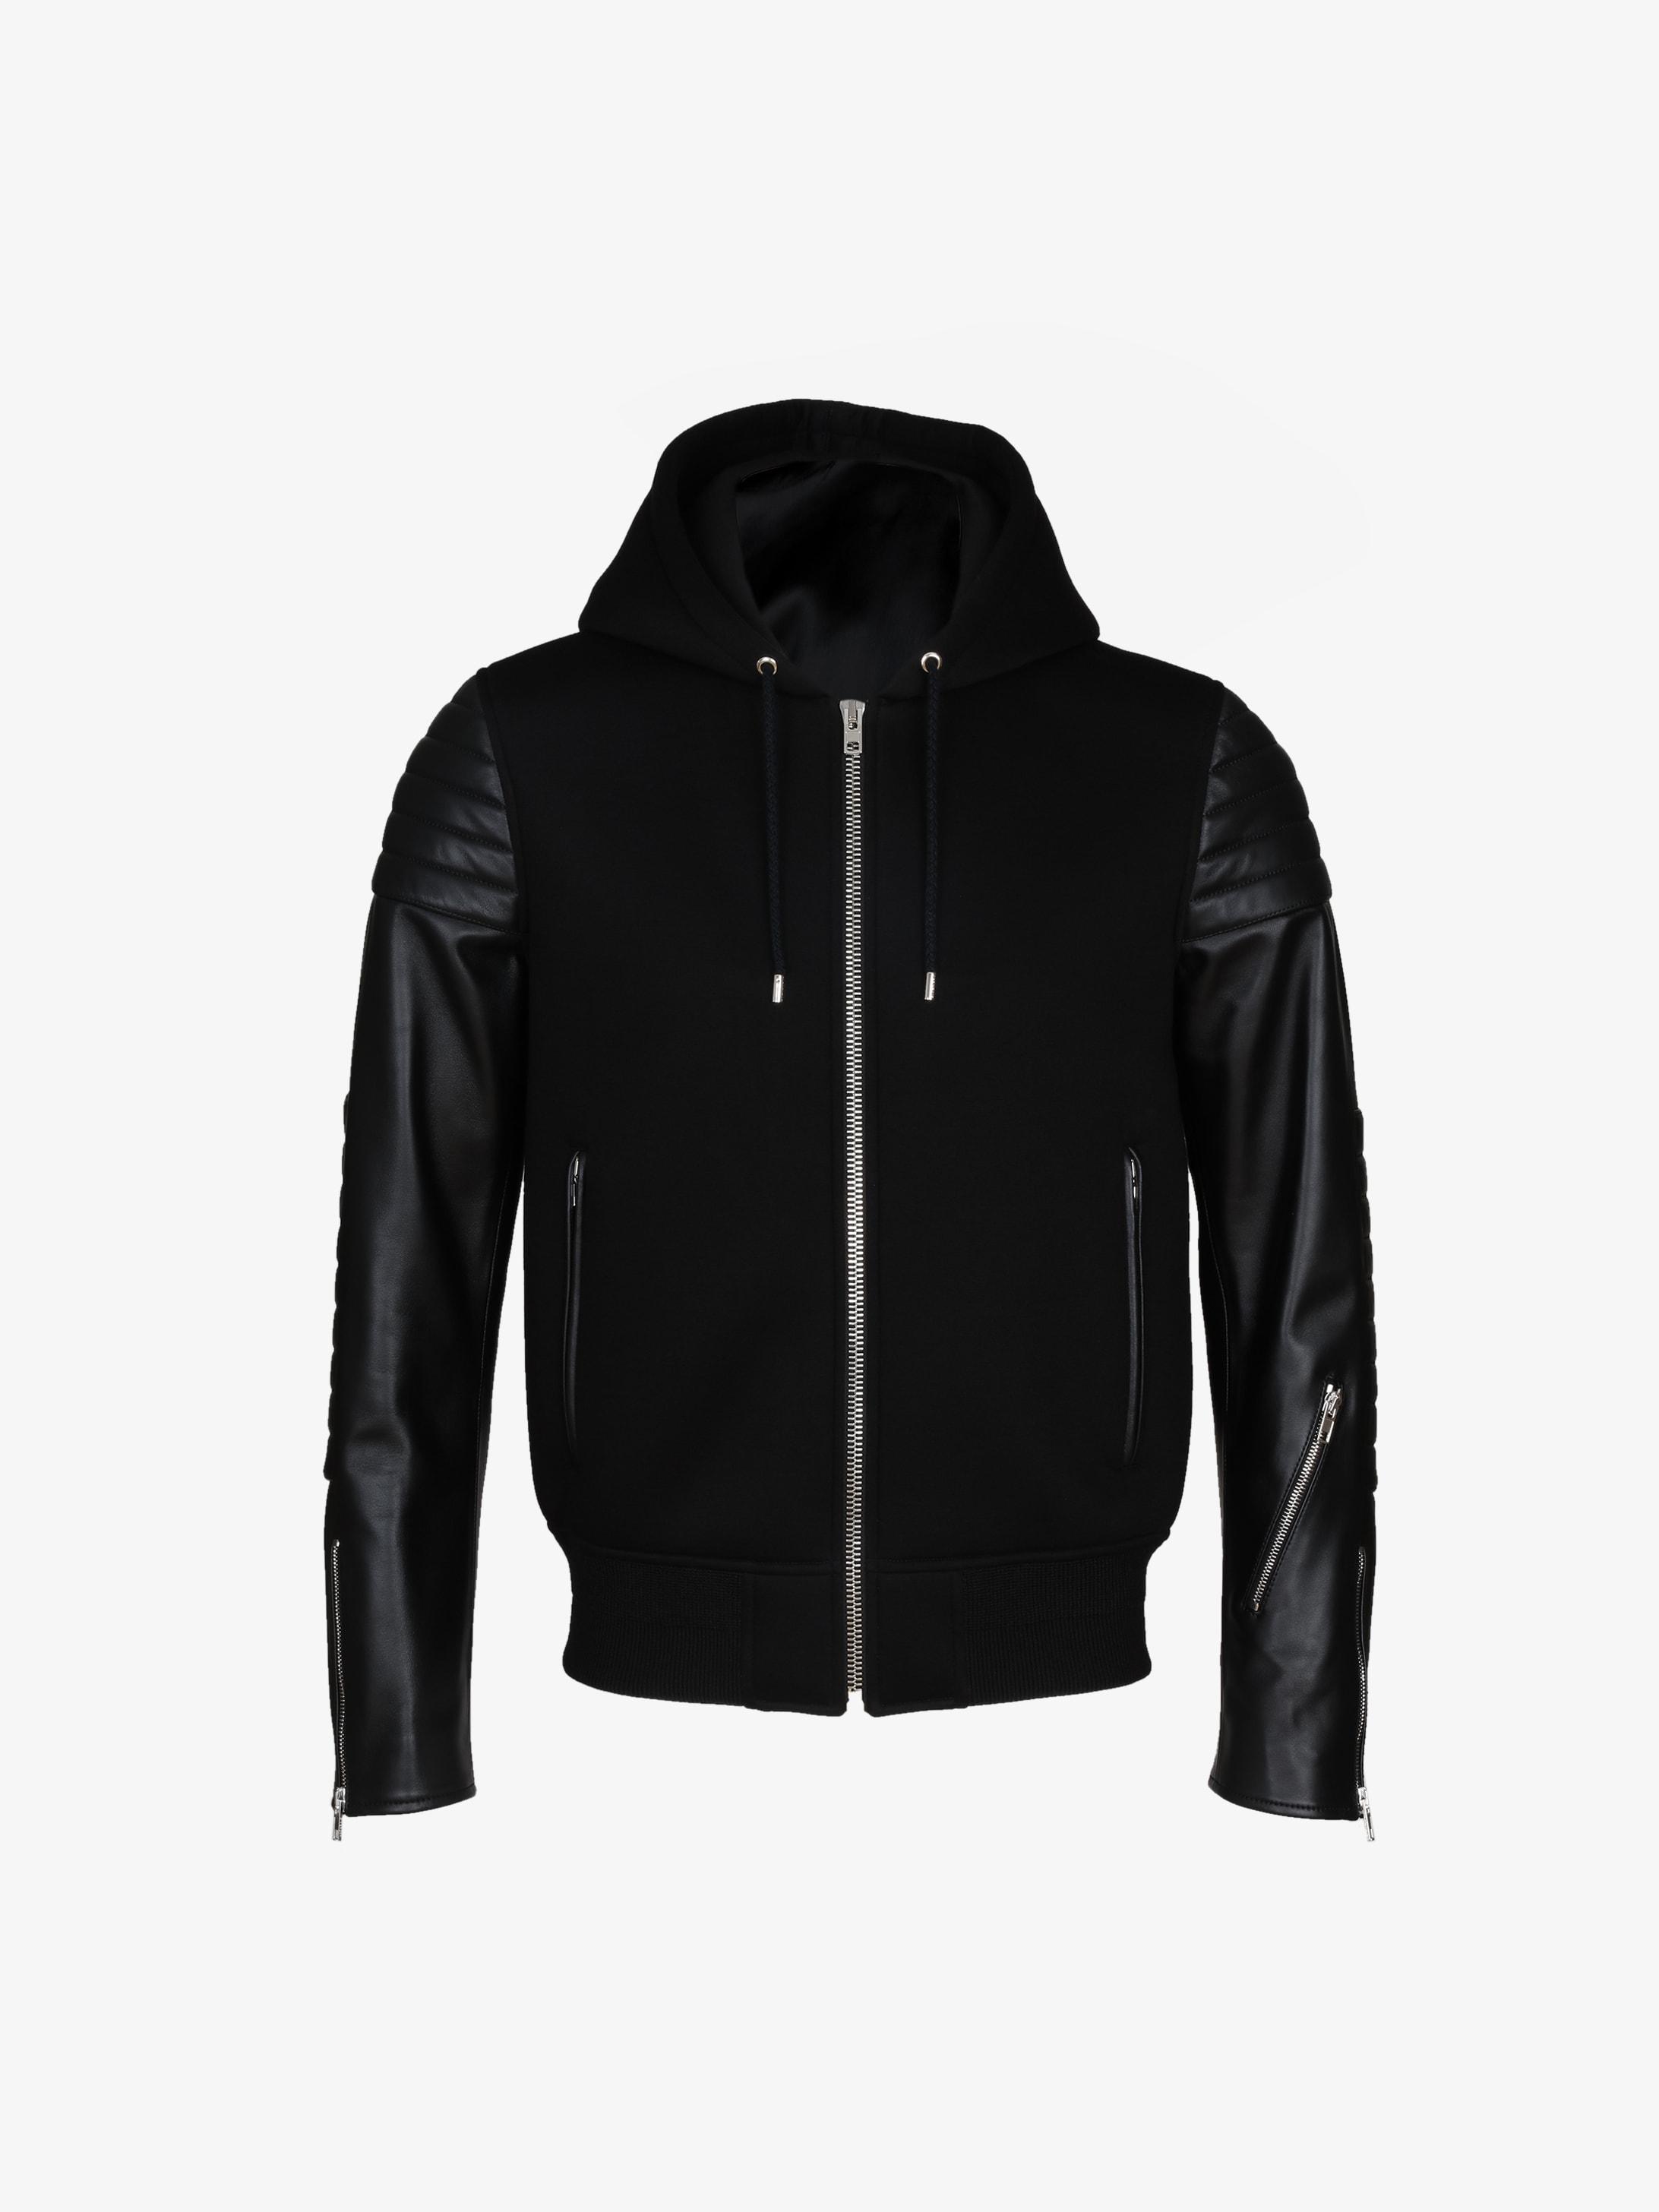 Neoprene and leather zipped hoodie